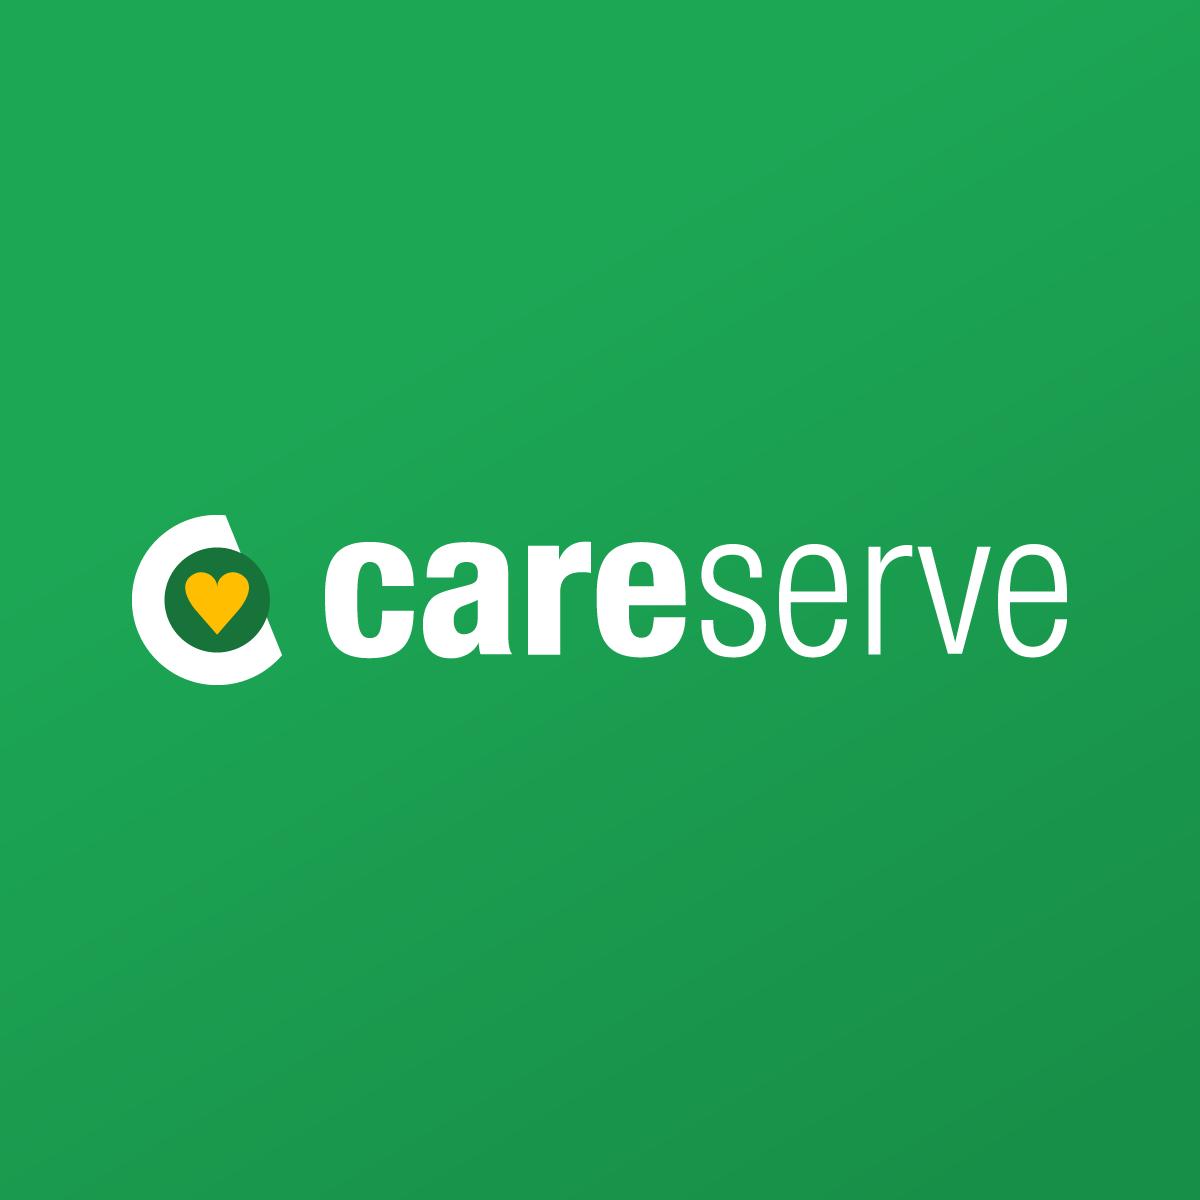 Logo Careserve